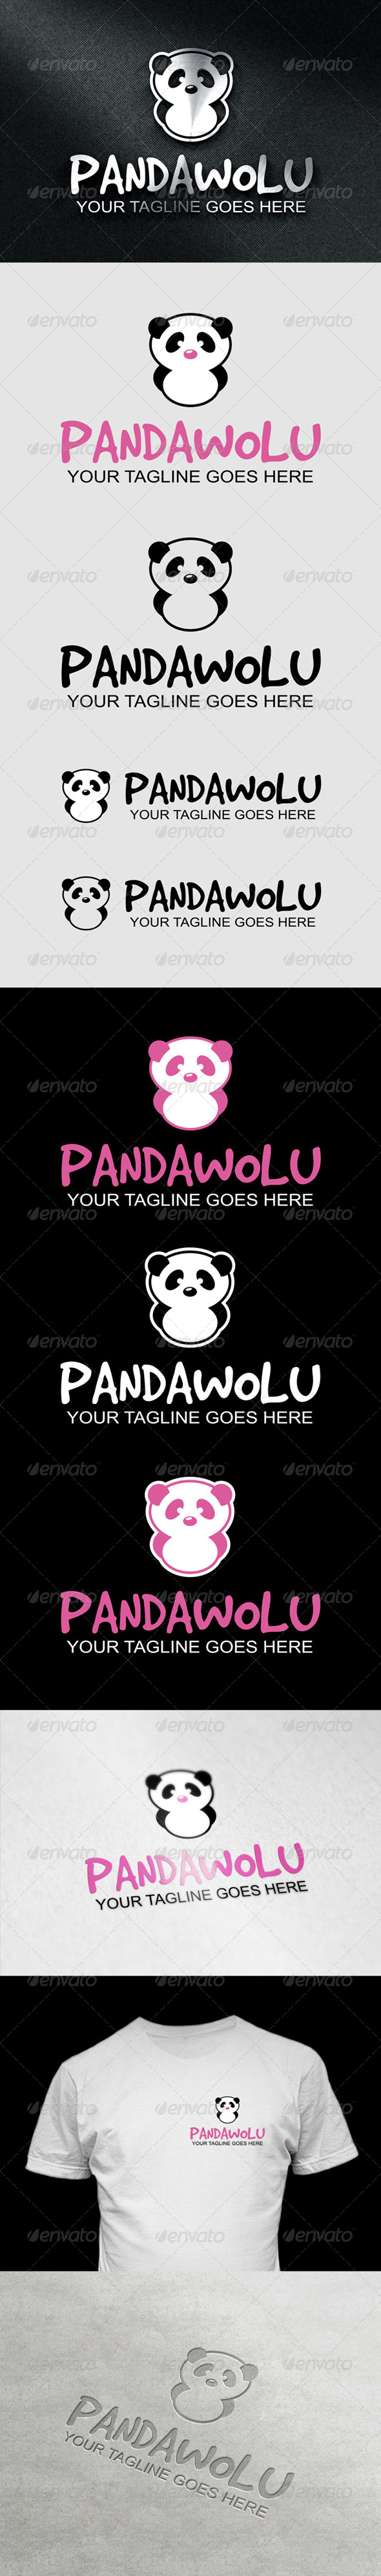 PandaWolu Logo - Animals Logo Templates